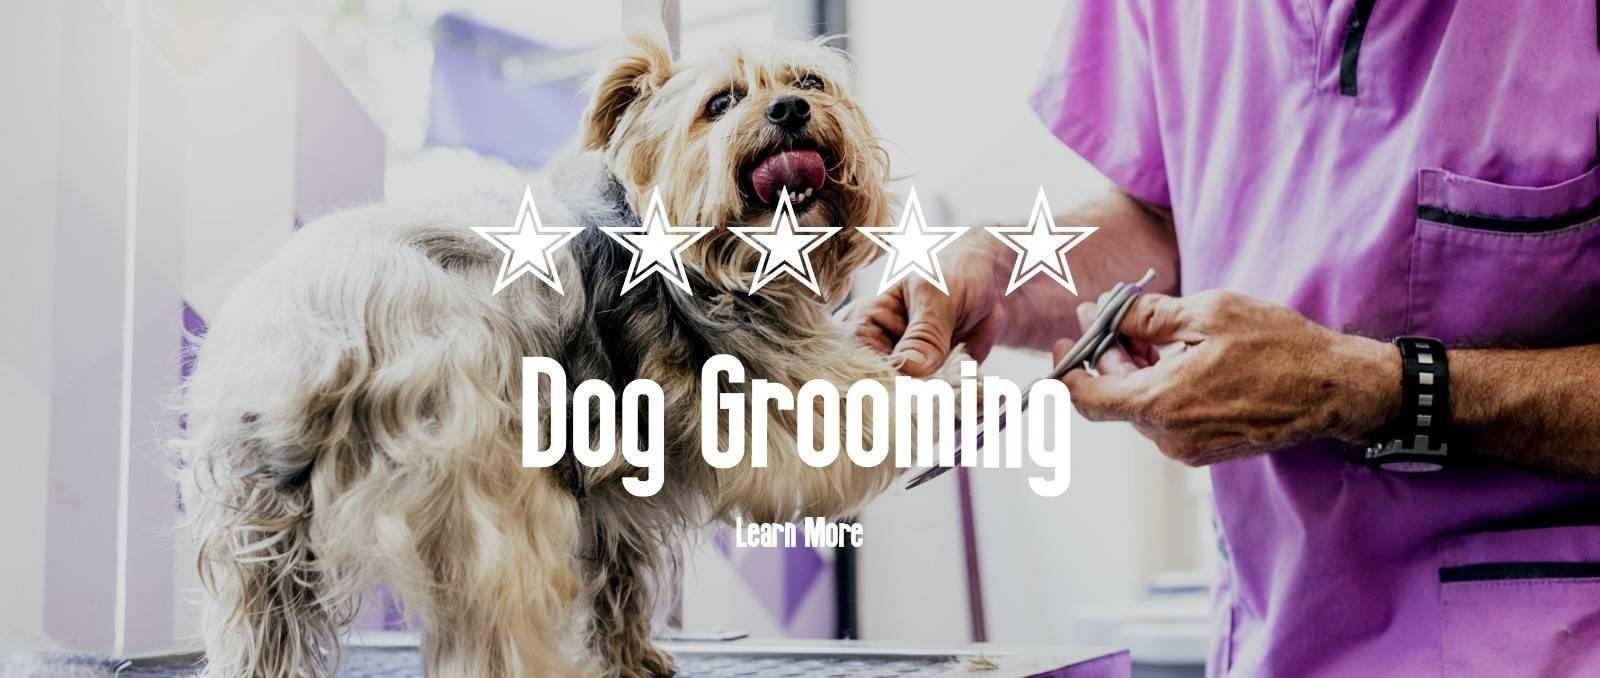 Dog Grooming Dog Groomers